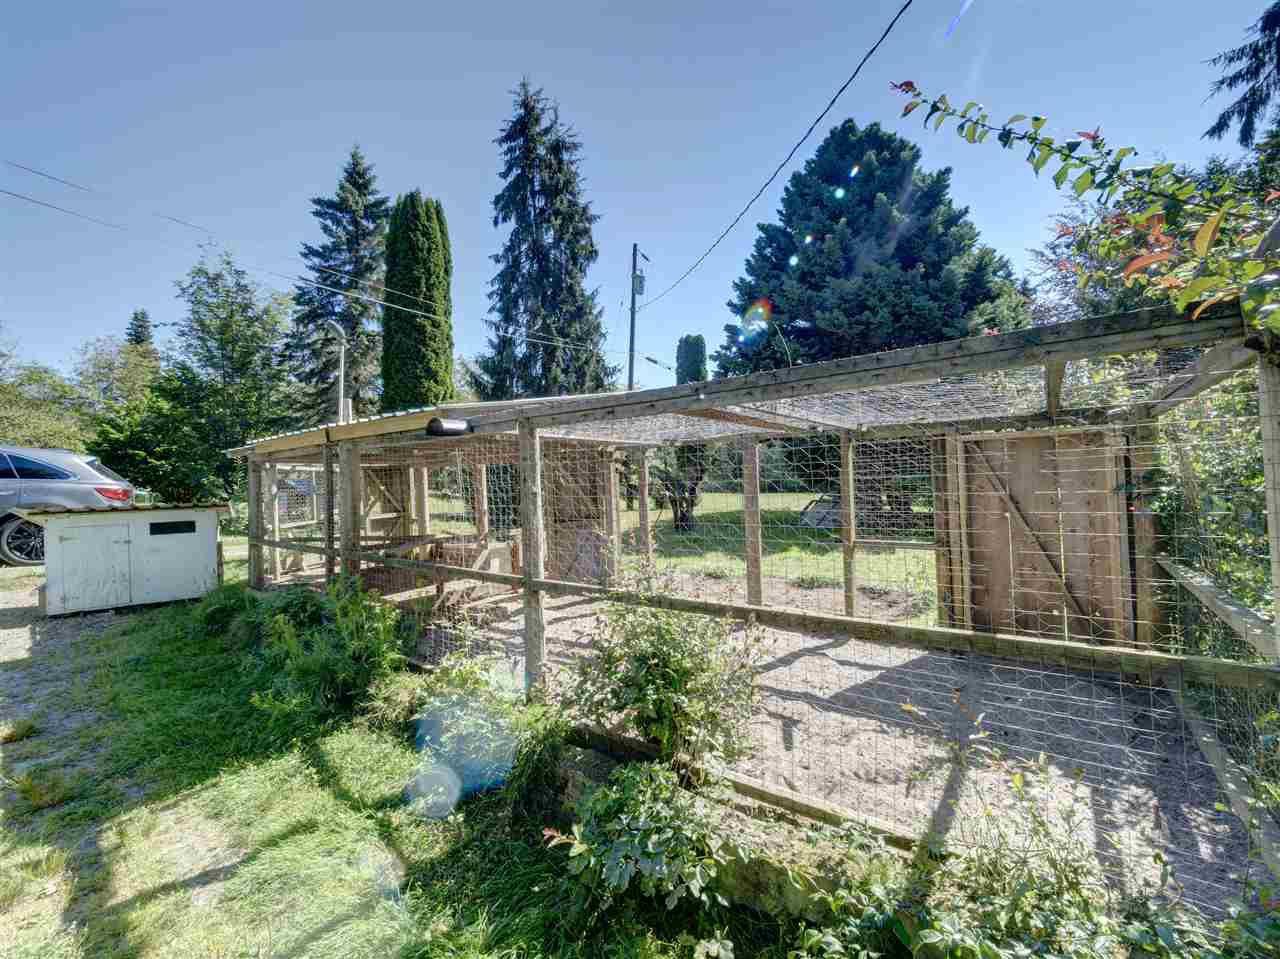 Photo 24: Photos: 5761 MCLAUGHAN Road in Sechelt: Sechelt District House for sale (Sunshine Coast)  : MLS®# R2479077